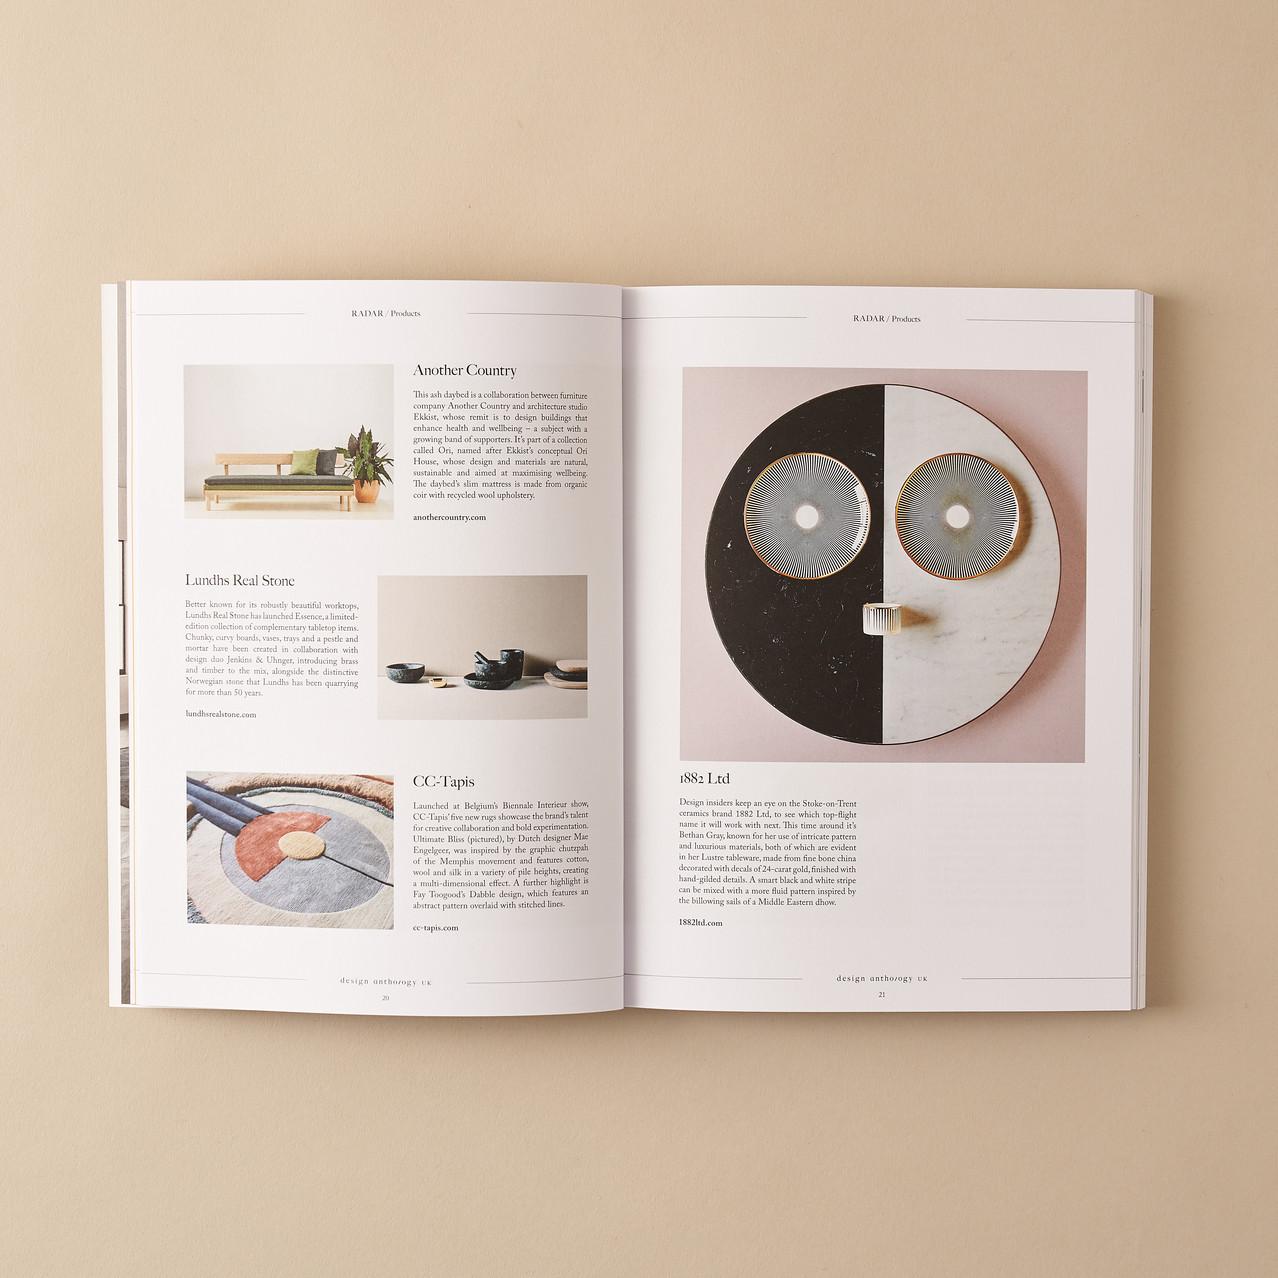 Design-Anthology-12.11.185268